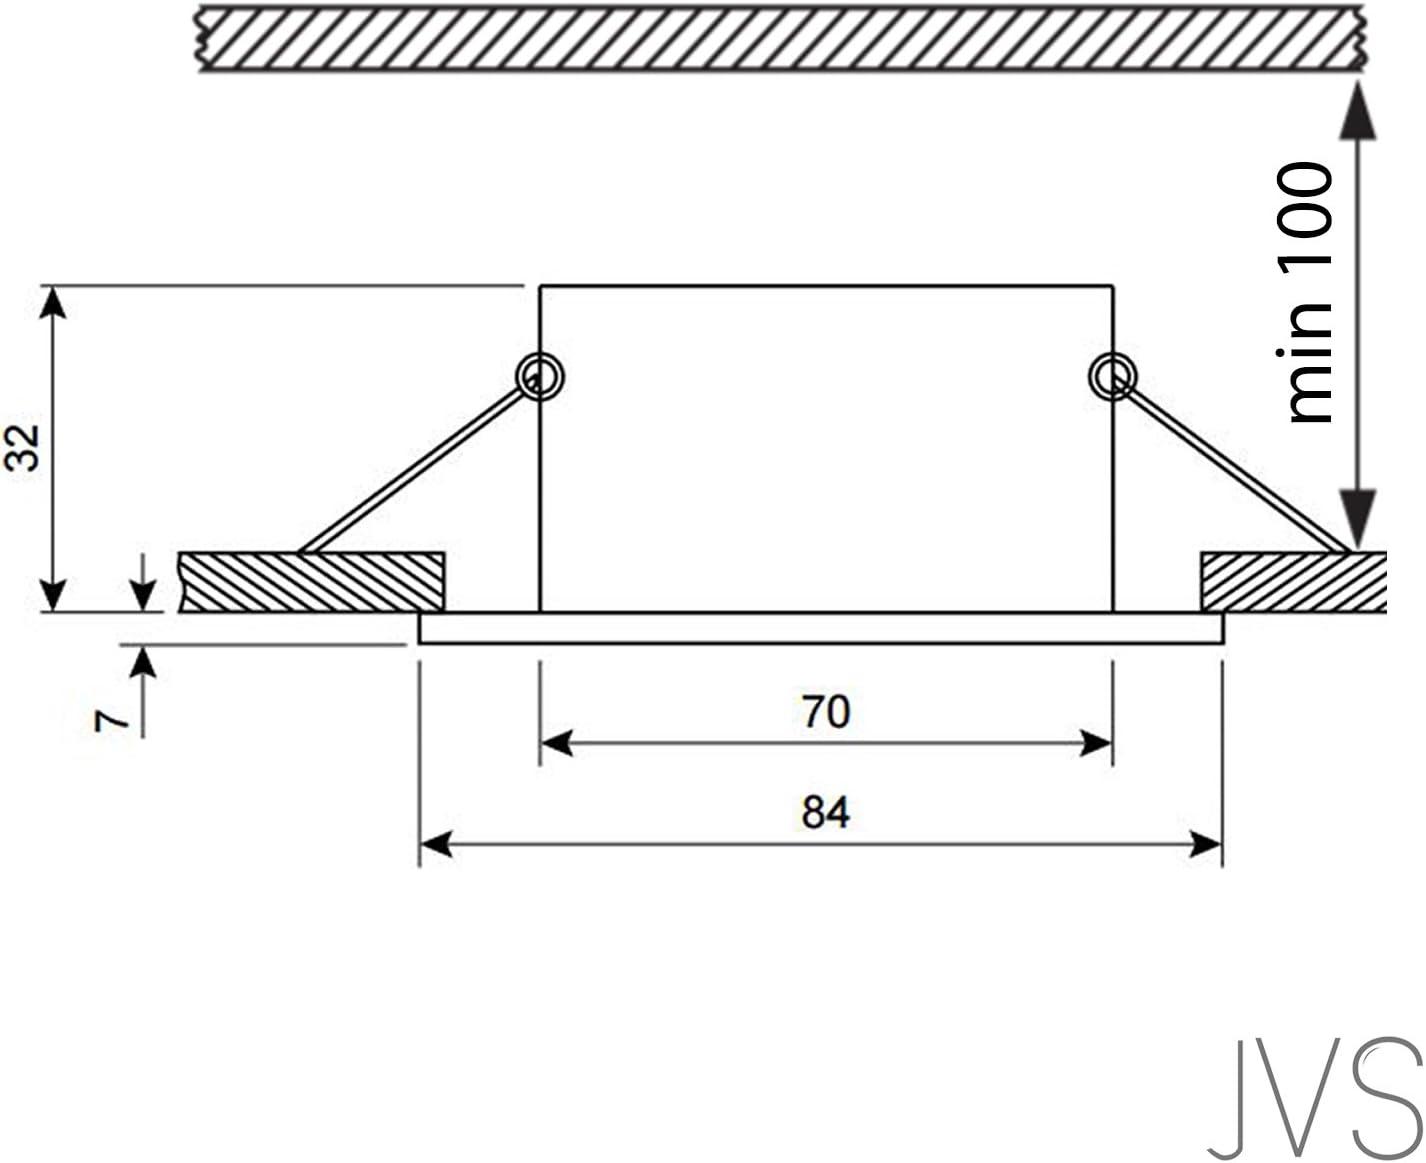 LED Einbaustrahler VENEDIG (Weiss) Rund Inkl. 3 X 3.5W LED Warmweiss 230V IP44 LED Deckenstrahler Einbauleuchte Deckeneinbaustrahler Einbauspot Spot Einbaustrahler Deckeneinbauleuchte 6er Set